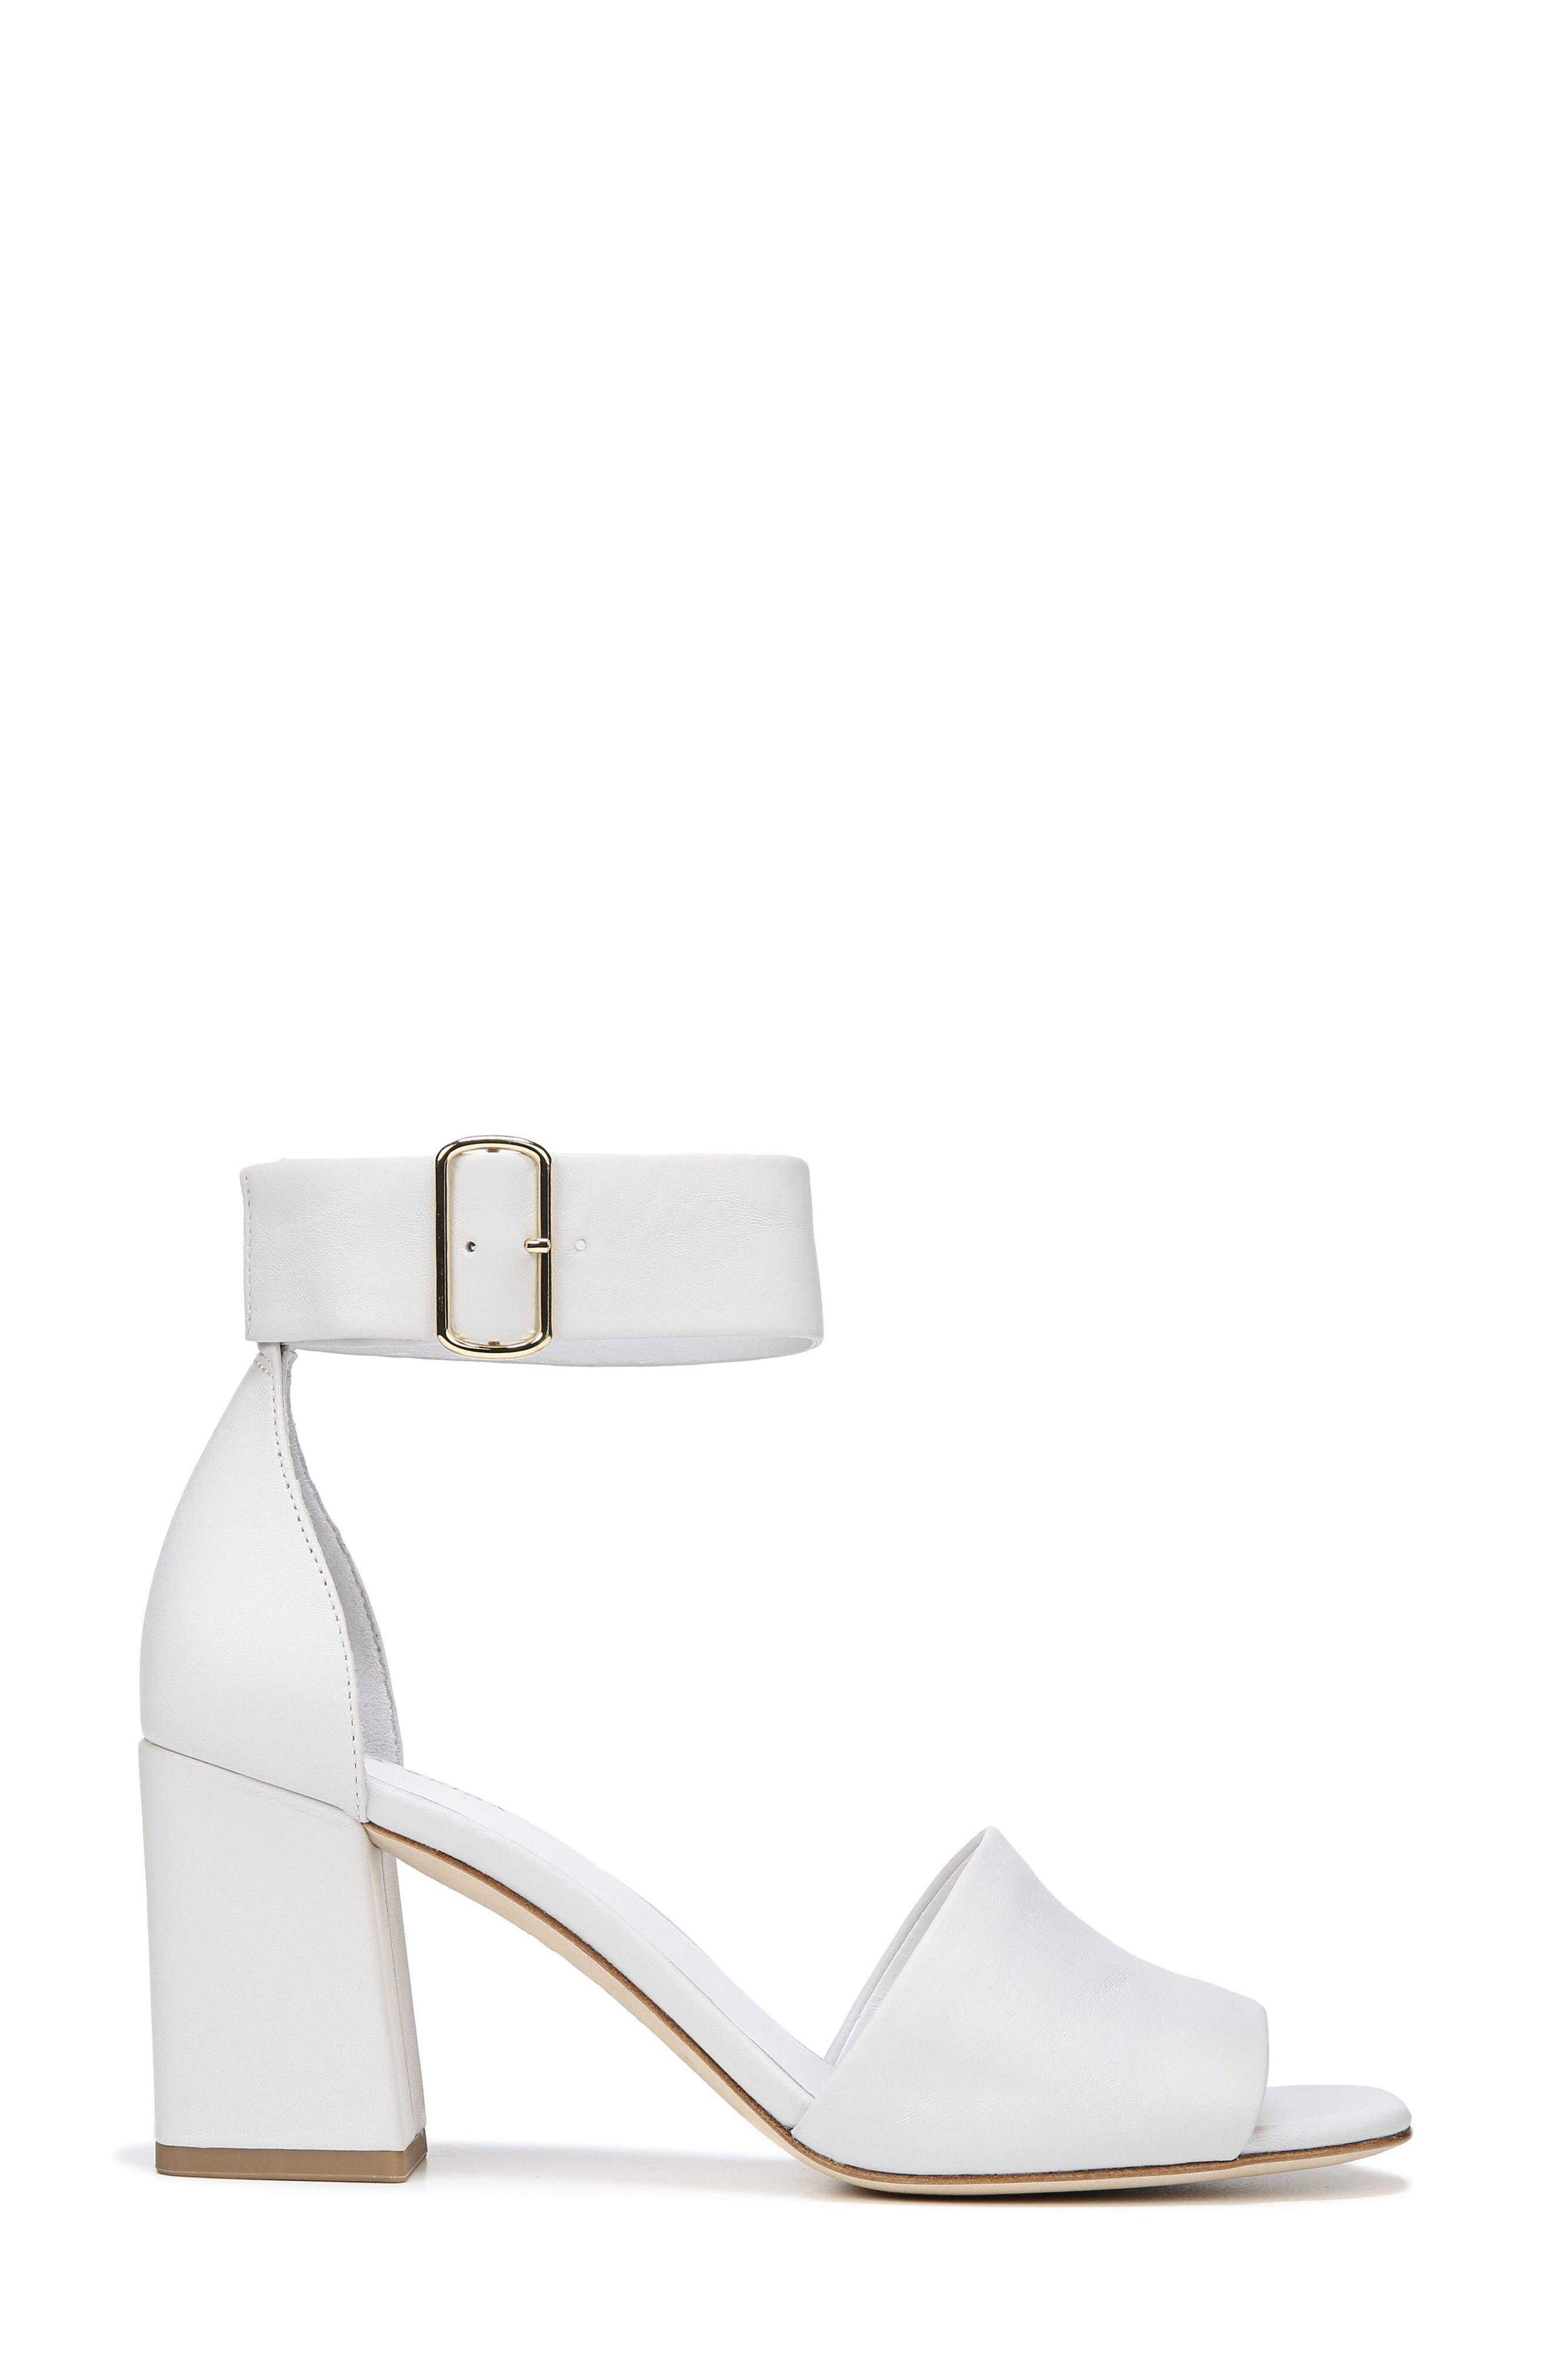 Evonne Ankle Strap Sandal,                             Alternate thumbnail 3, color,                             Porcelain Leather